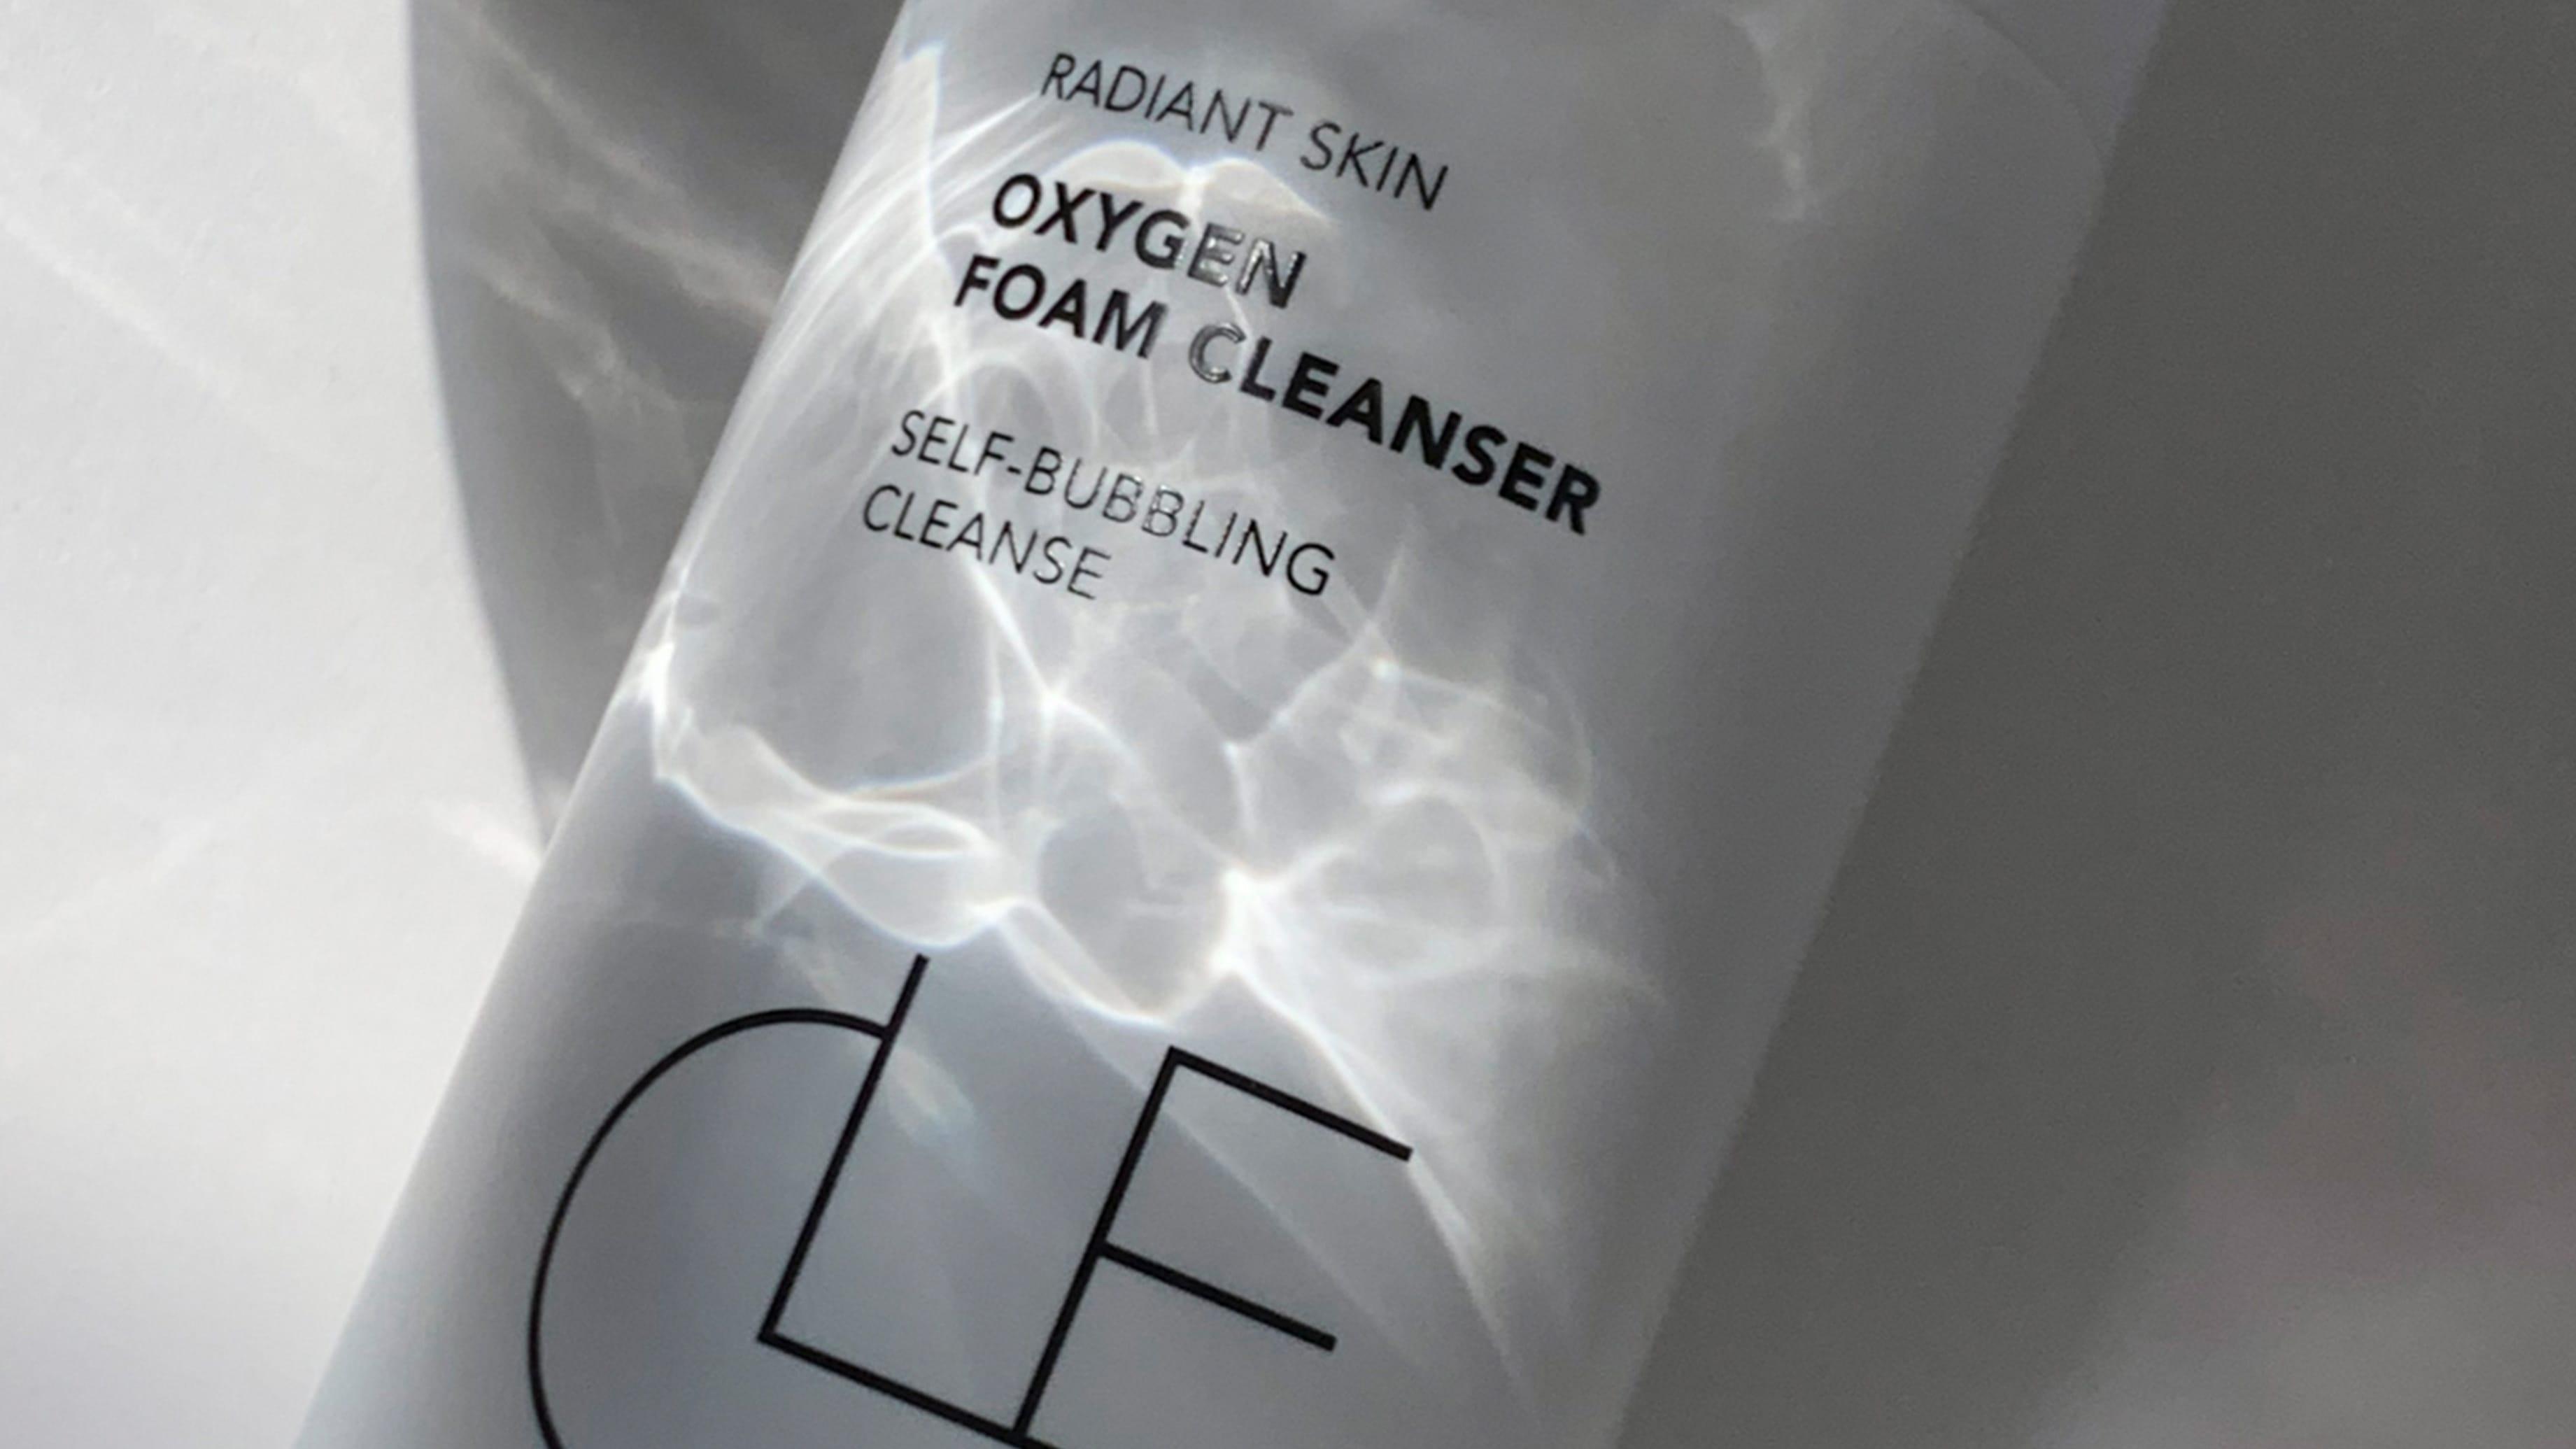 CLE Cosmetics Brand Image